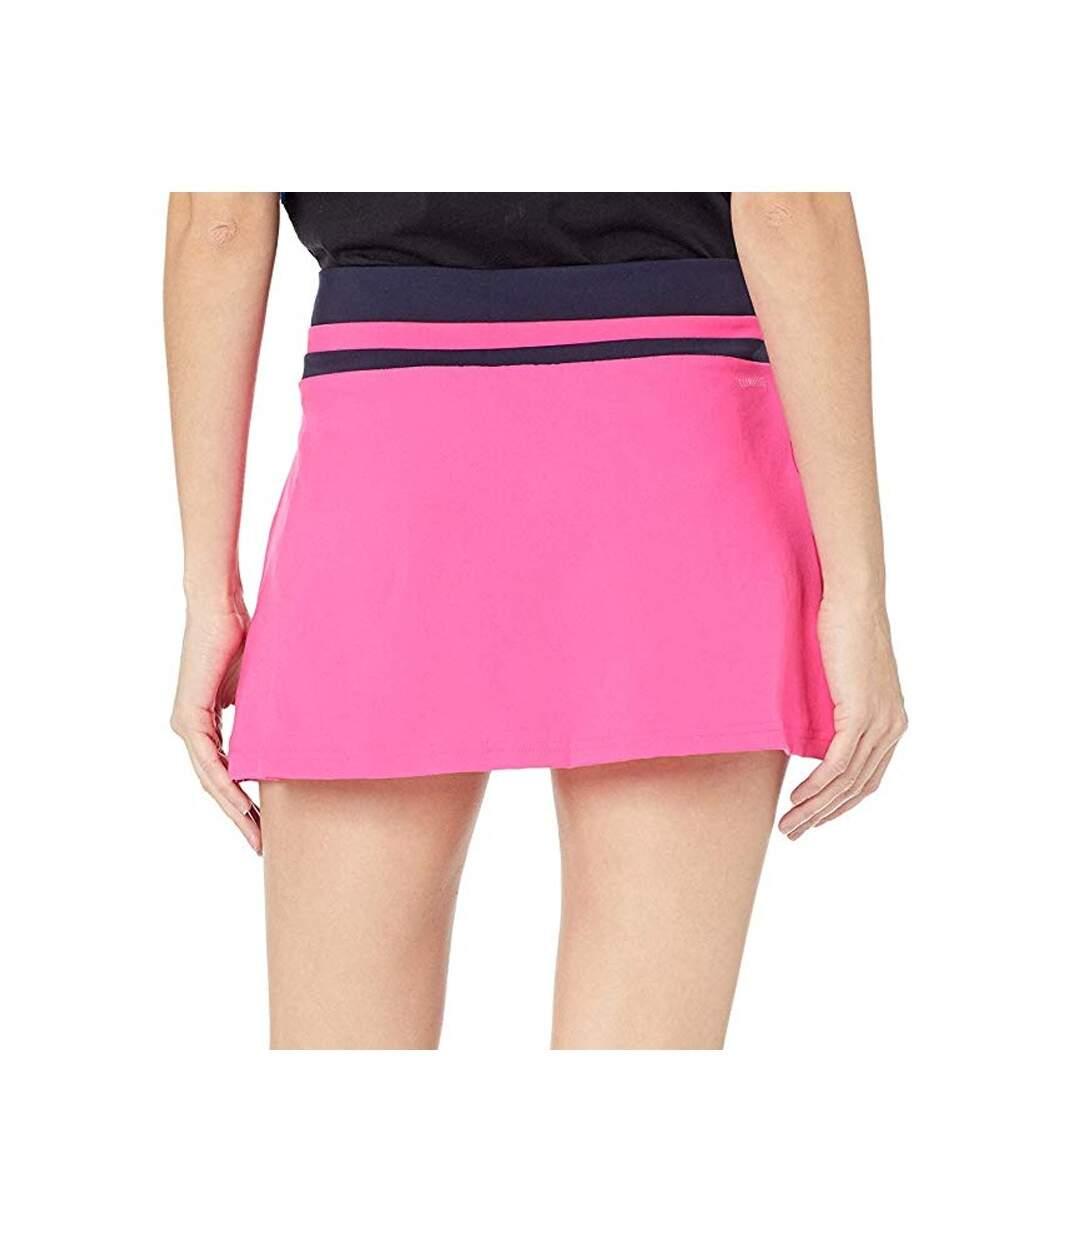 Dégagement Jupe short rose femme Adidas Club Skirt dsf.d455nksdKLFHG